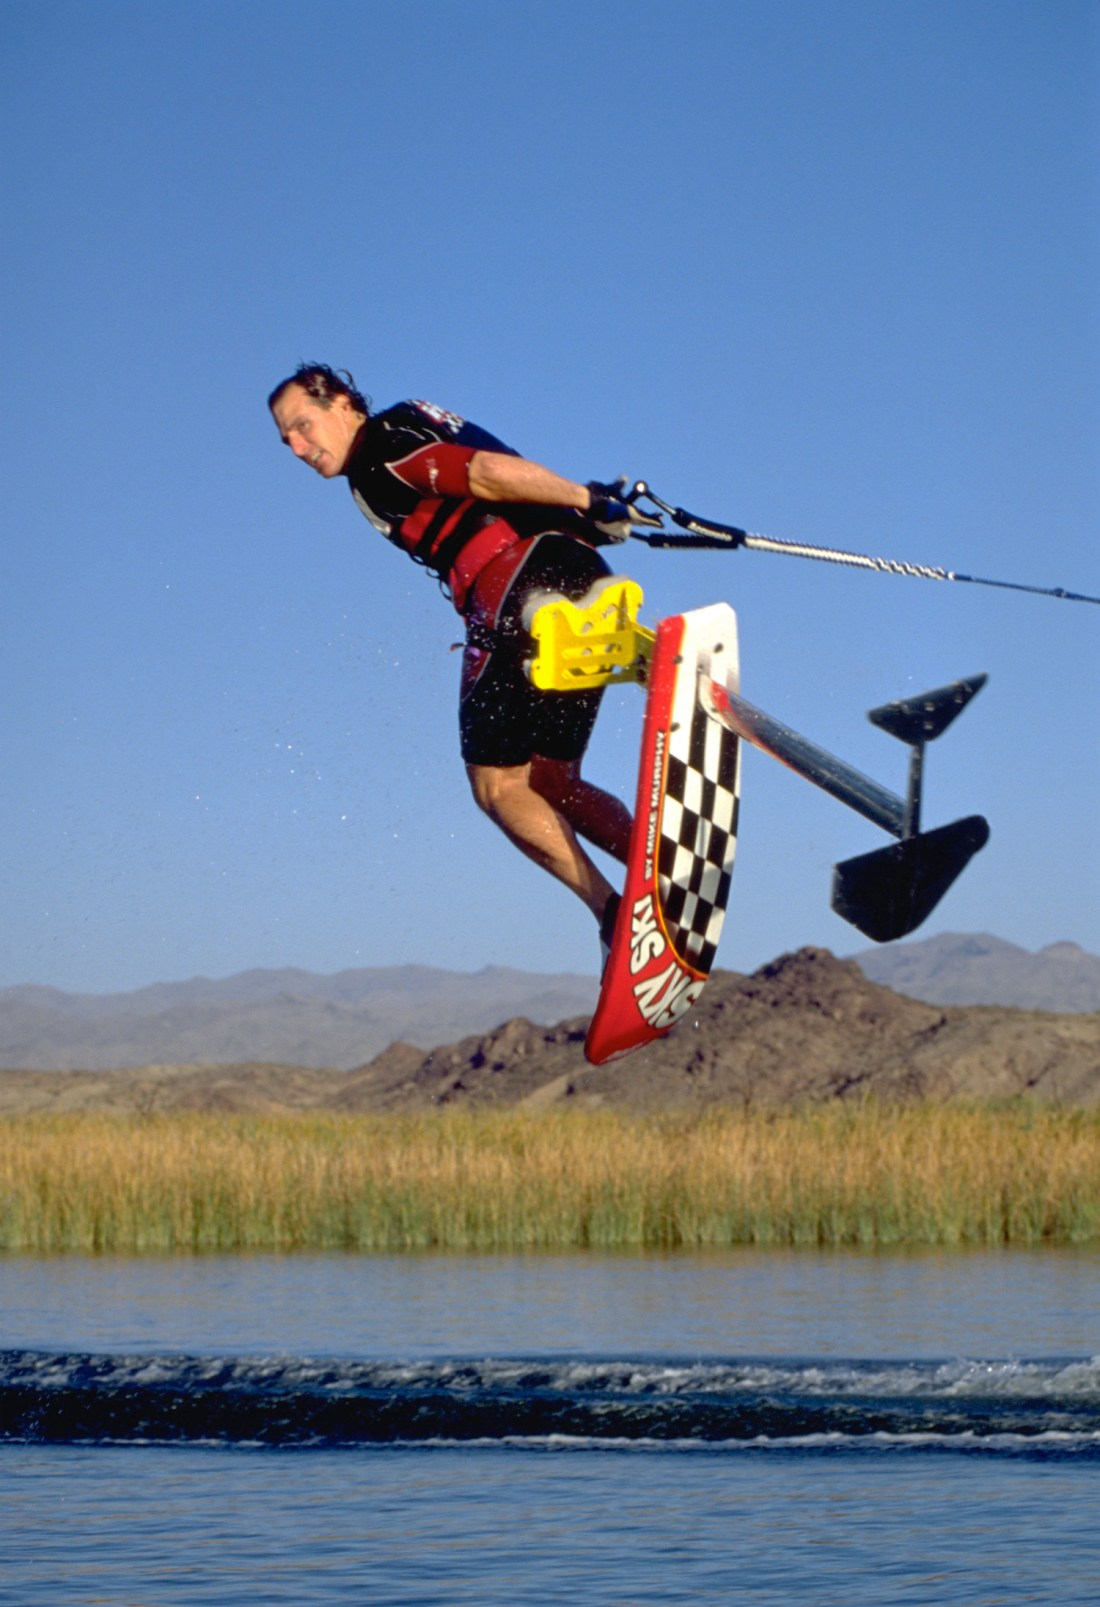 99_TonyKlarich.com_Water_Skiing_Hydrofoil_HELI_Creative_Commons_Free_3MR